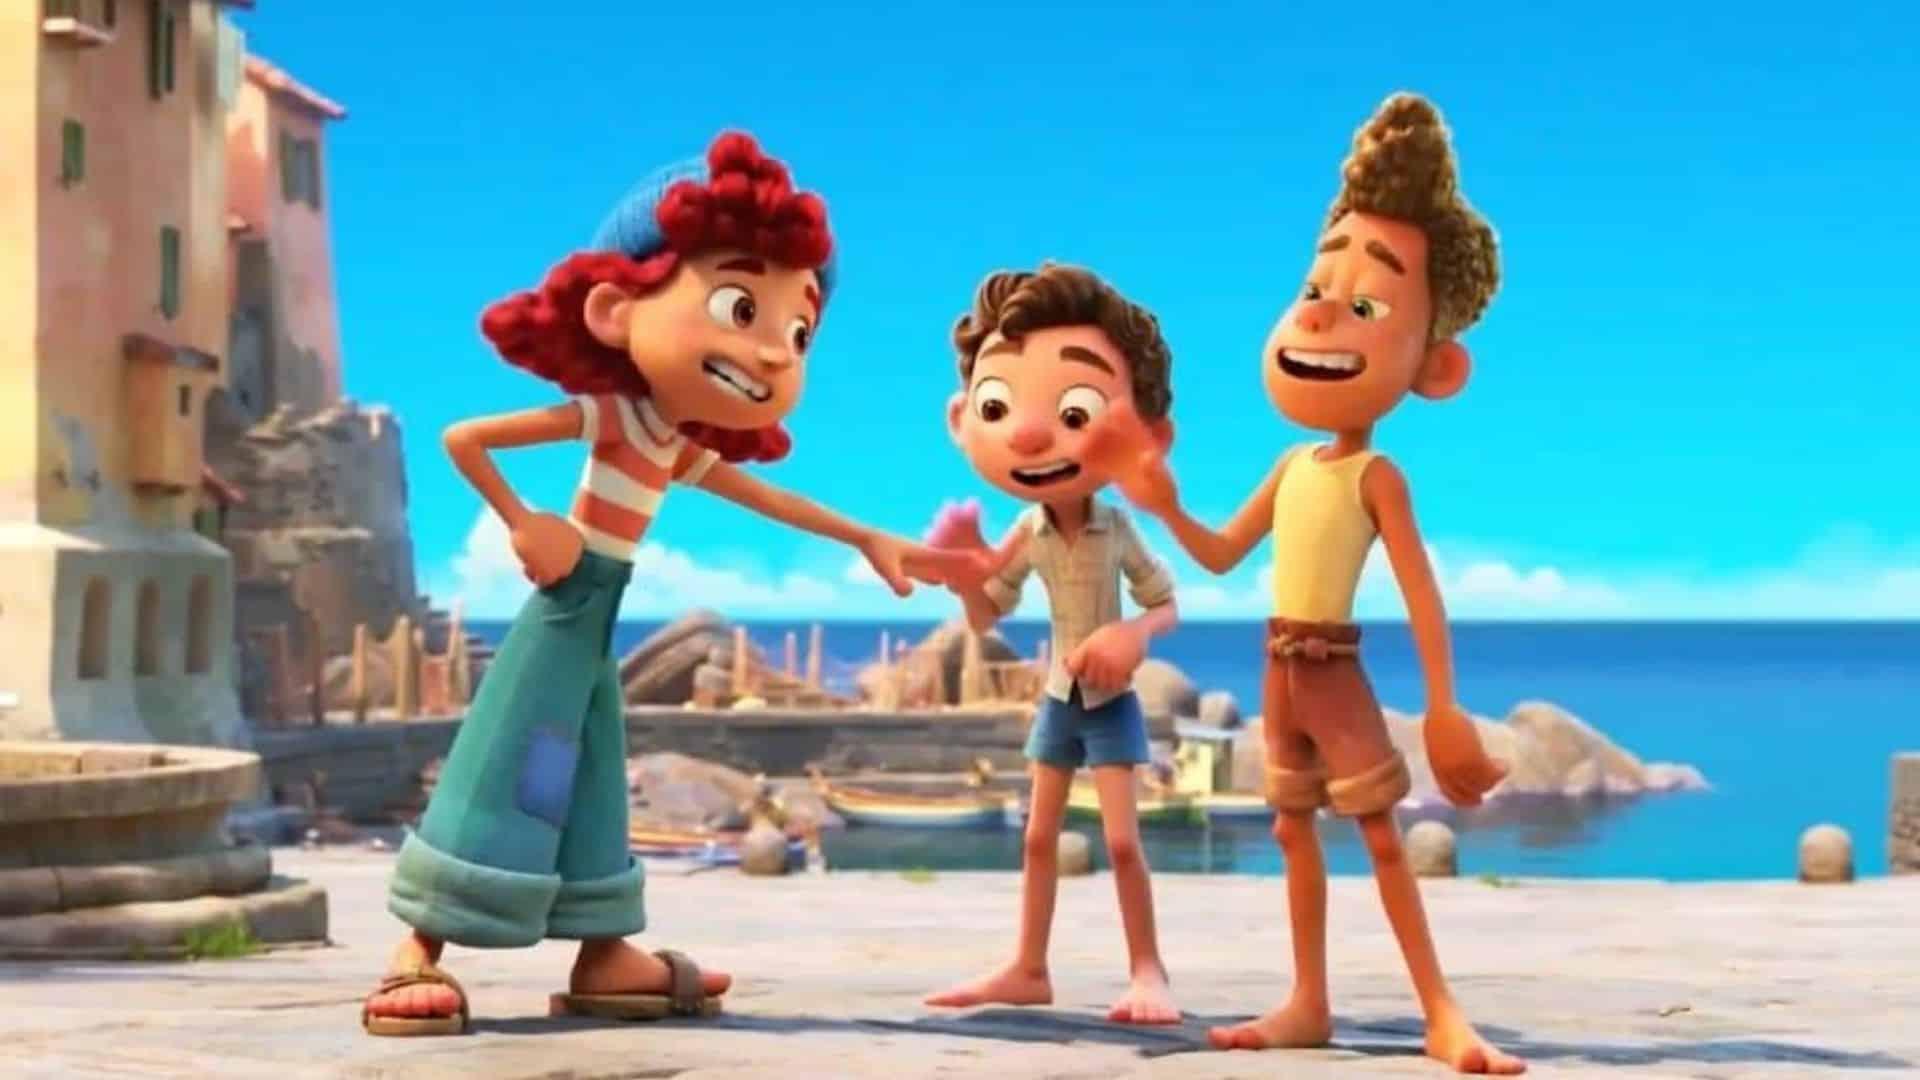 Luca Disney Pixar - Disney+ - cinematographe.it